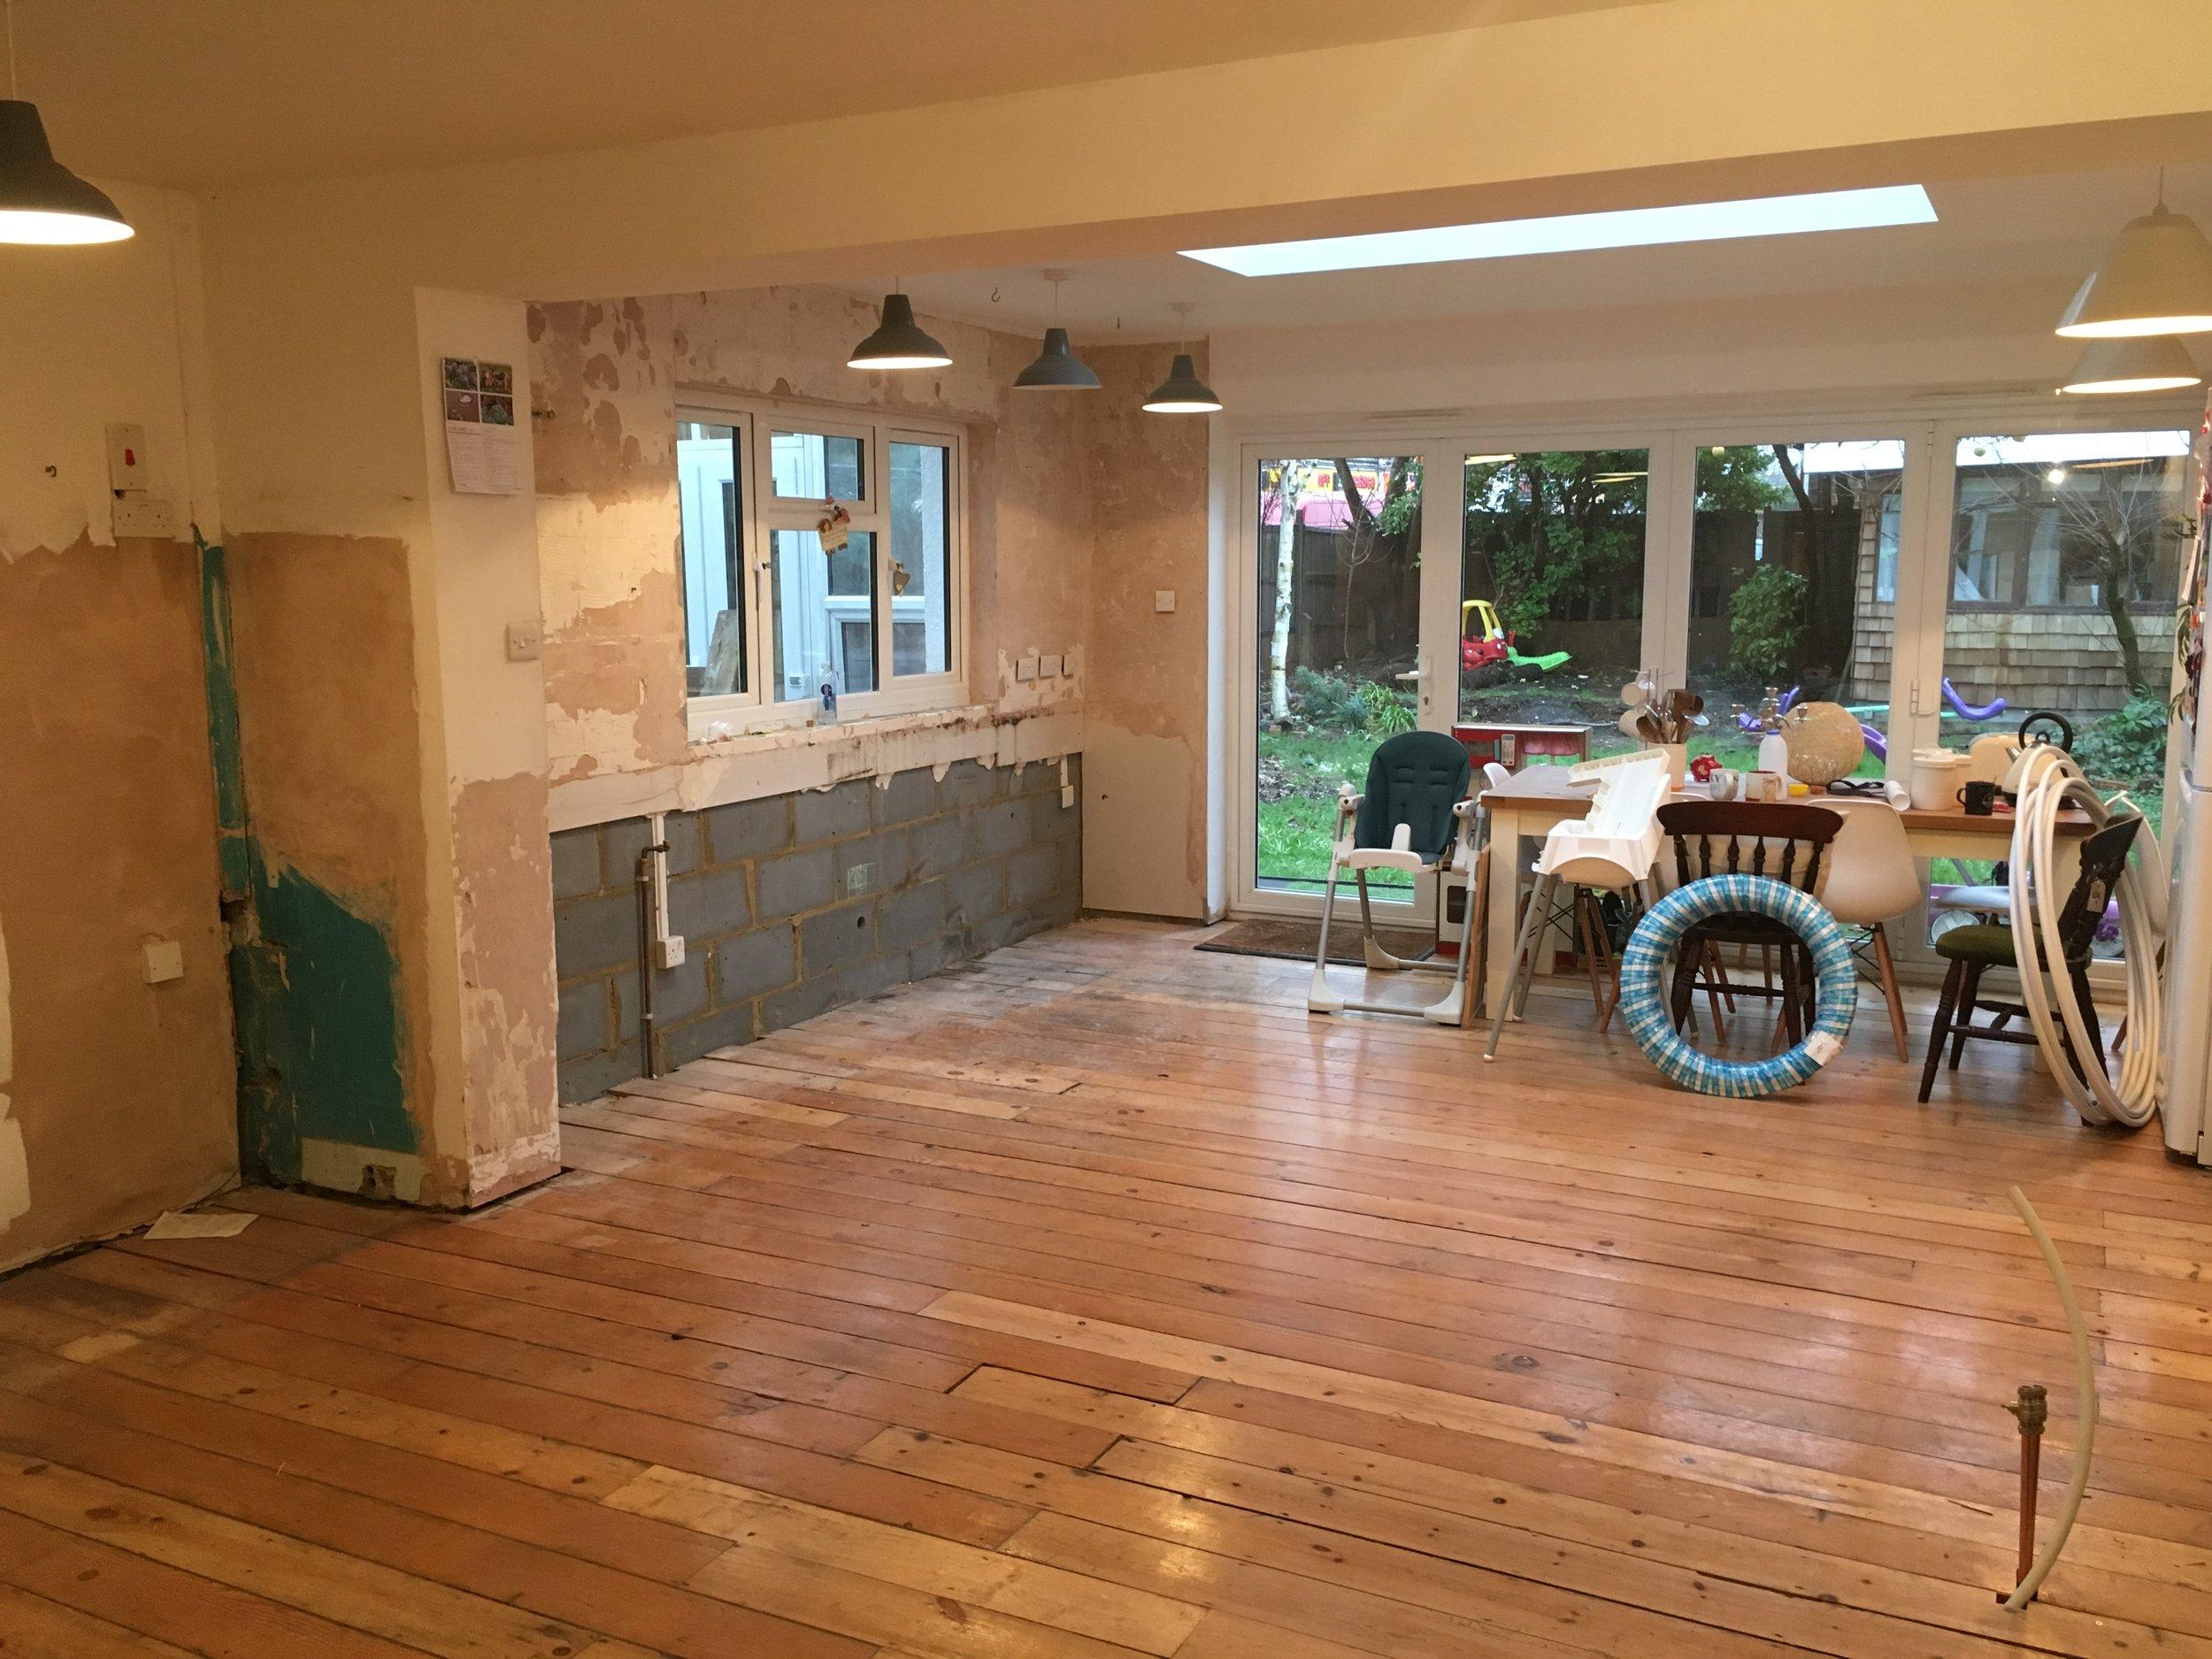 Kitchen Renovations begin